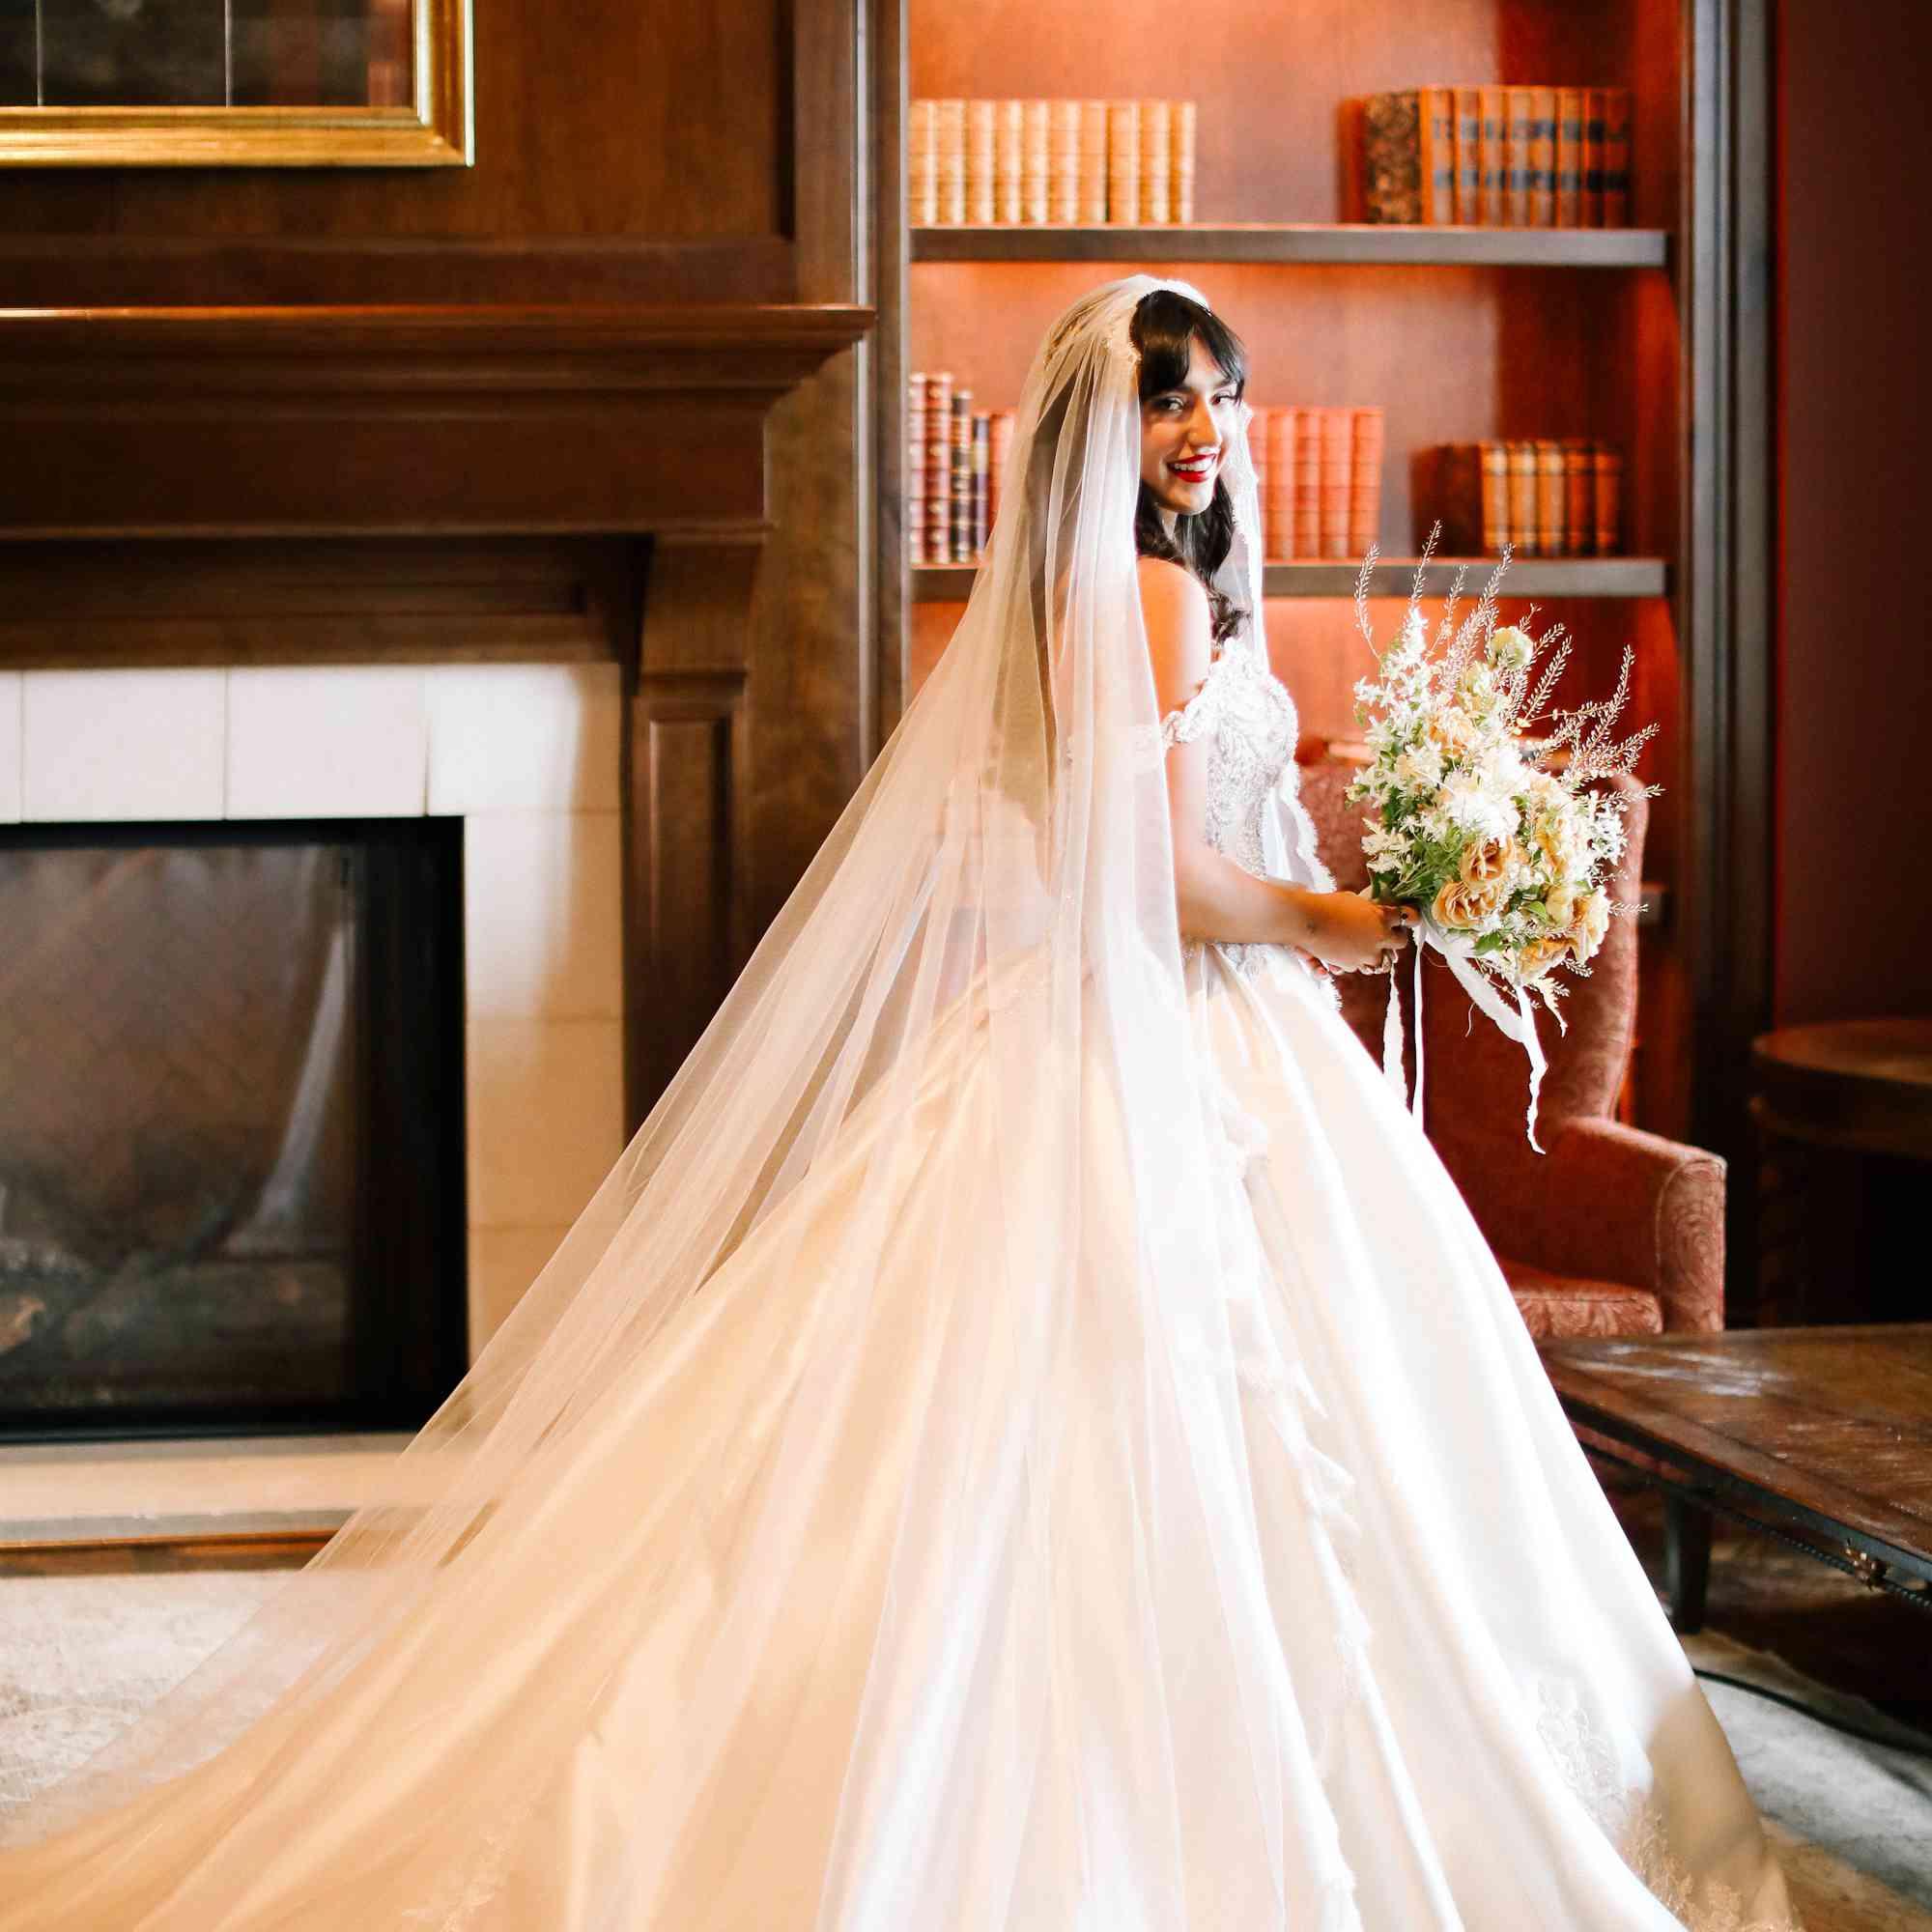 savannah and riker wedding, bride